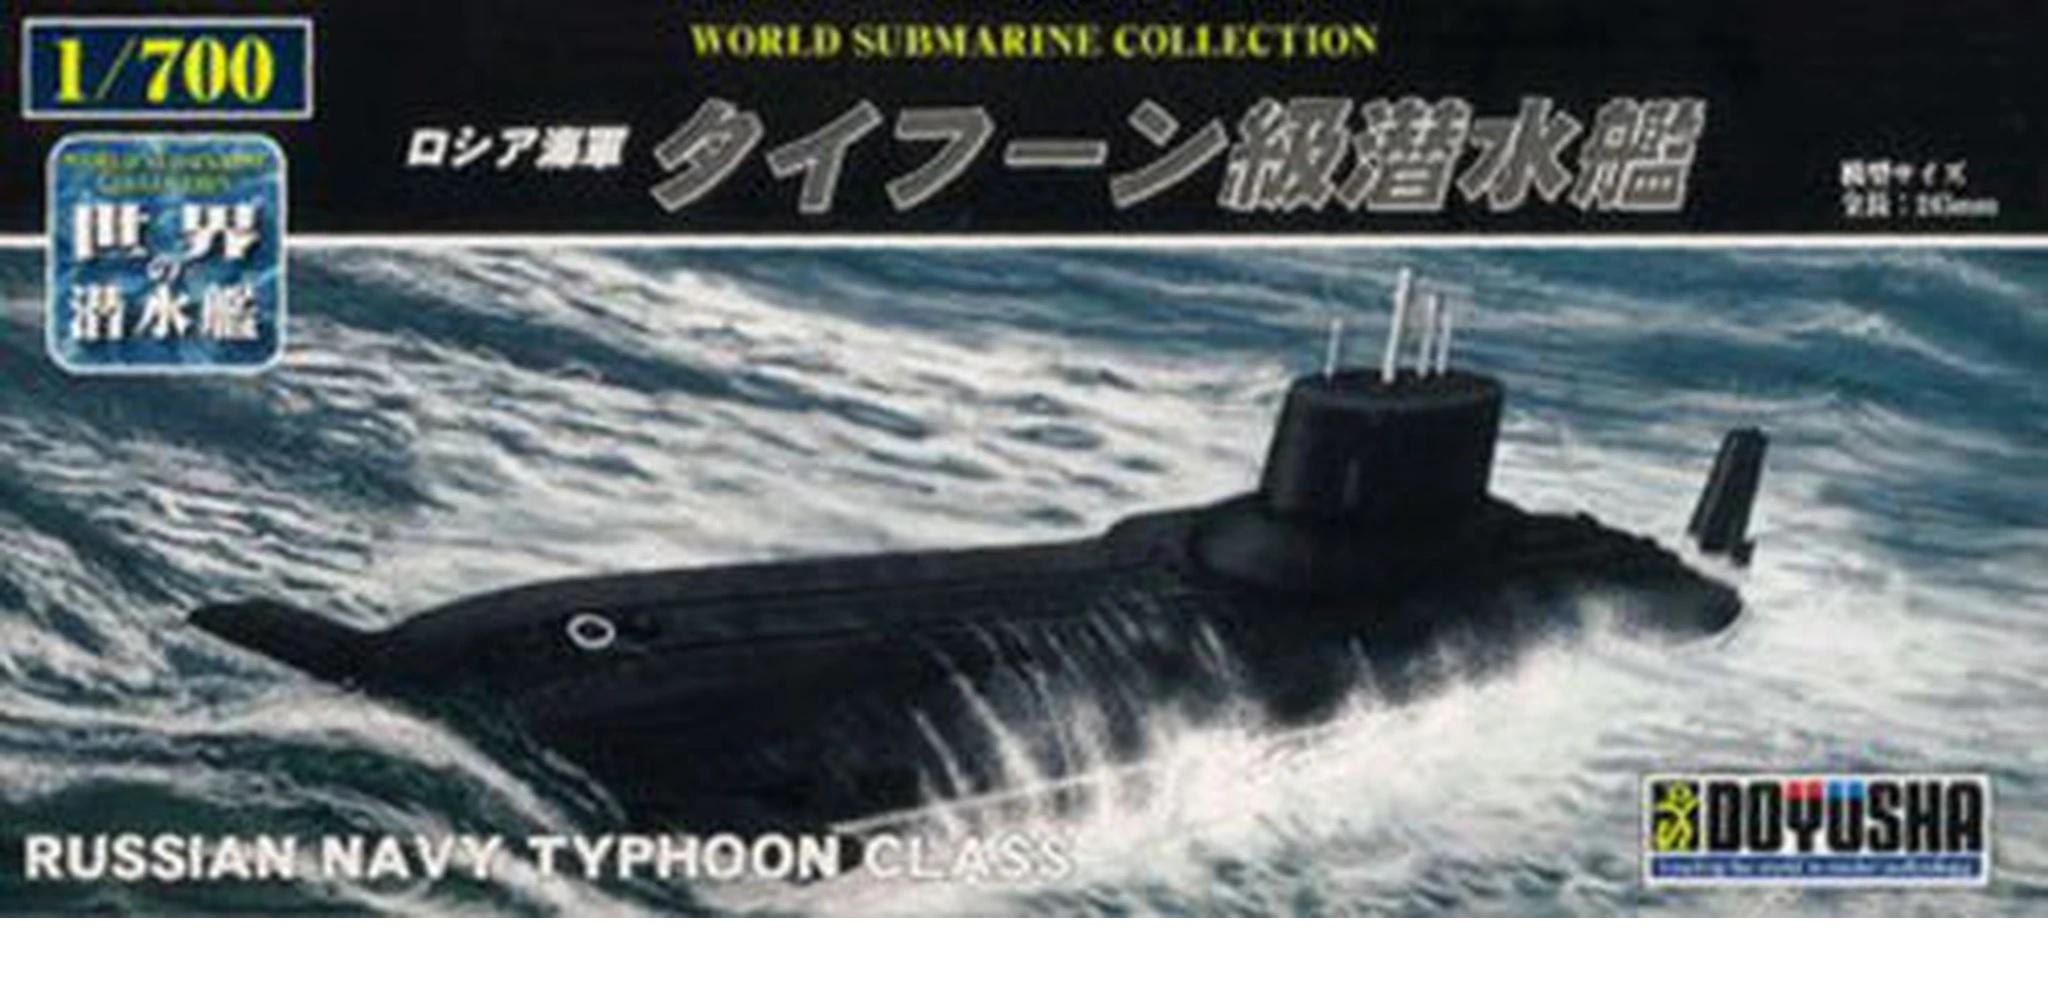 Doyusha 1/700 Russian Navy Typhoon Class Submarine